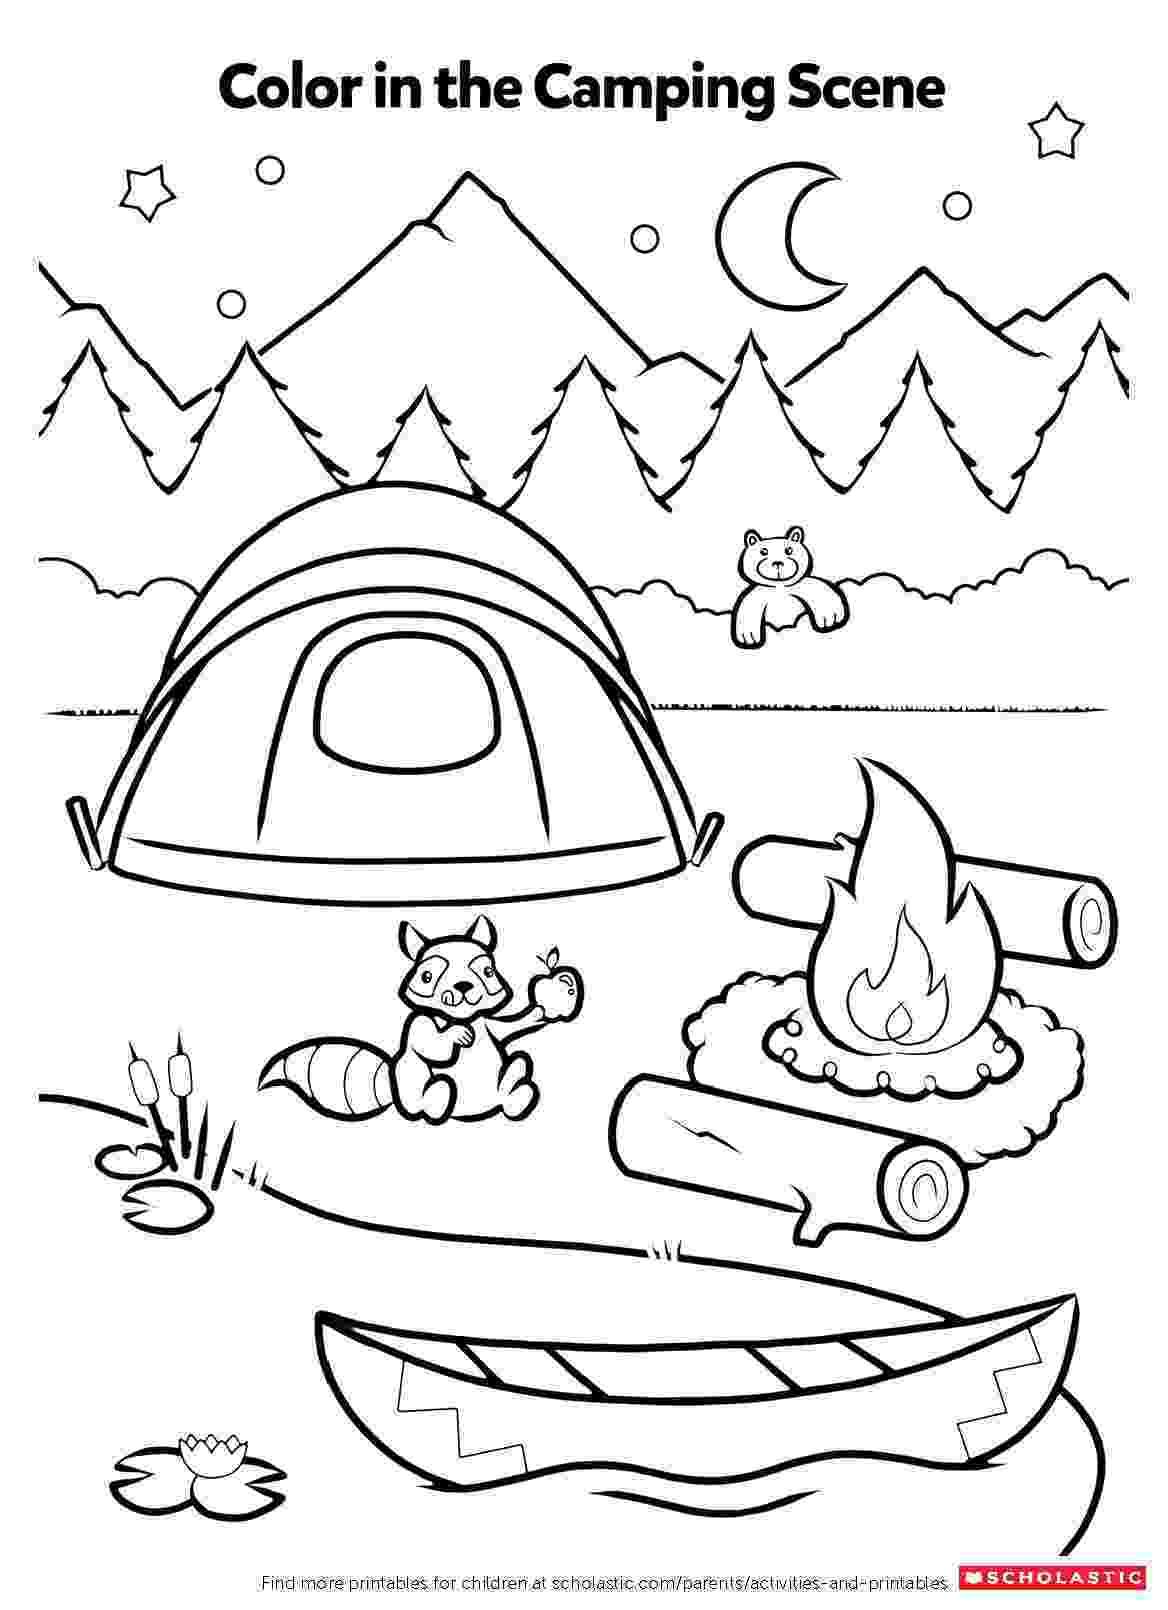 printable coloring sheets preschoolers campfire coloring activity worksheets printables sheets preschoolers printable coloring